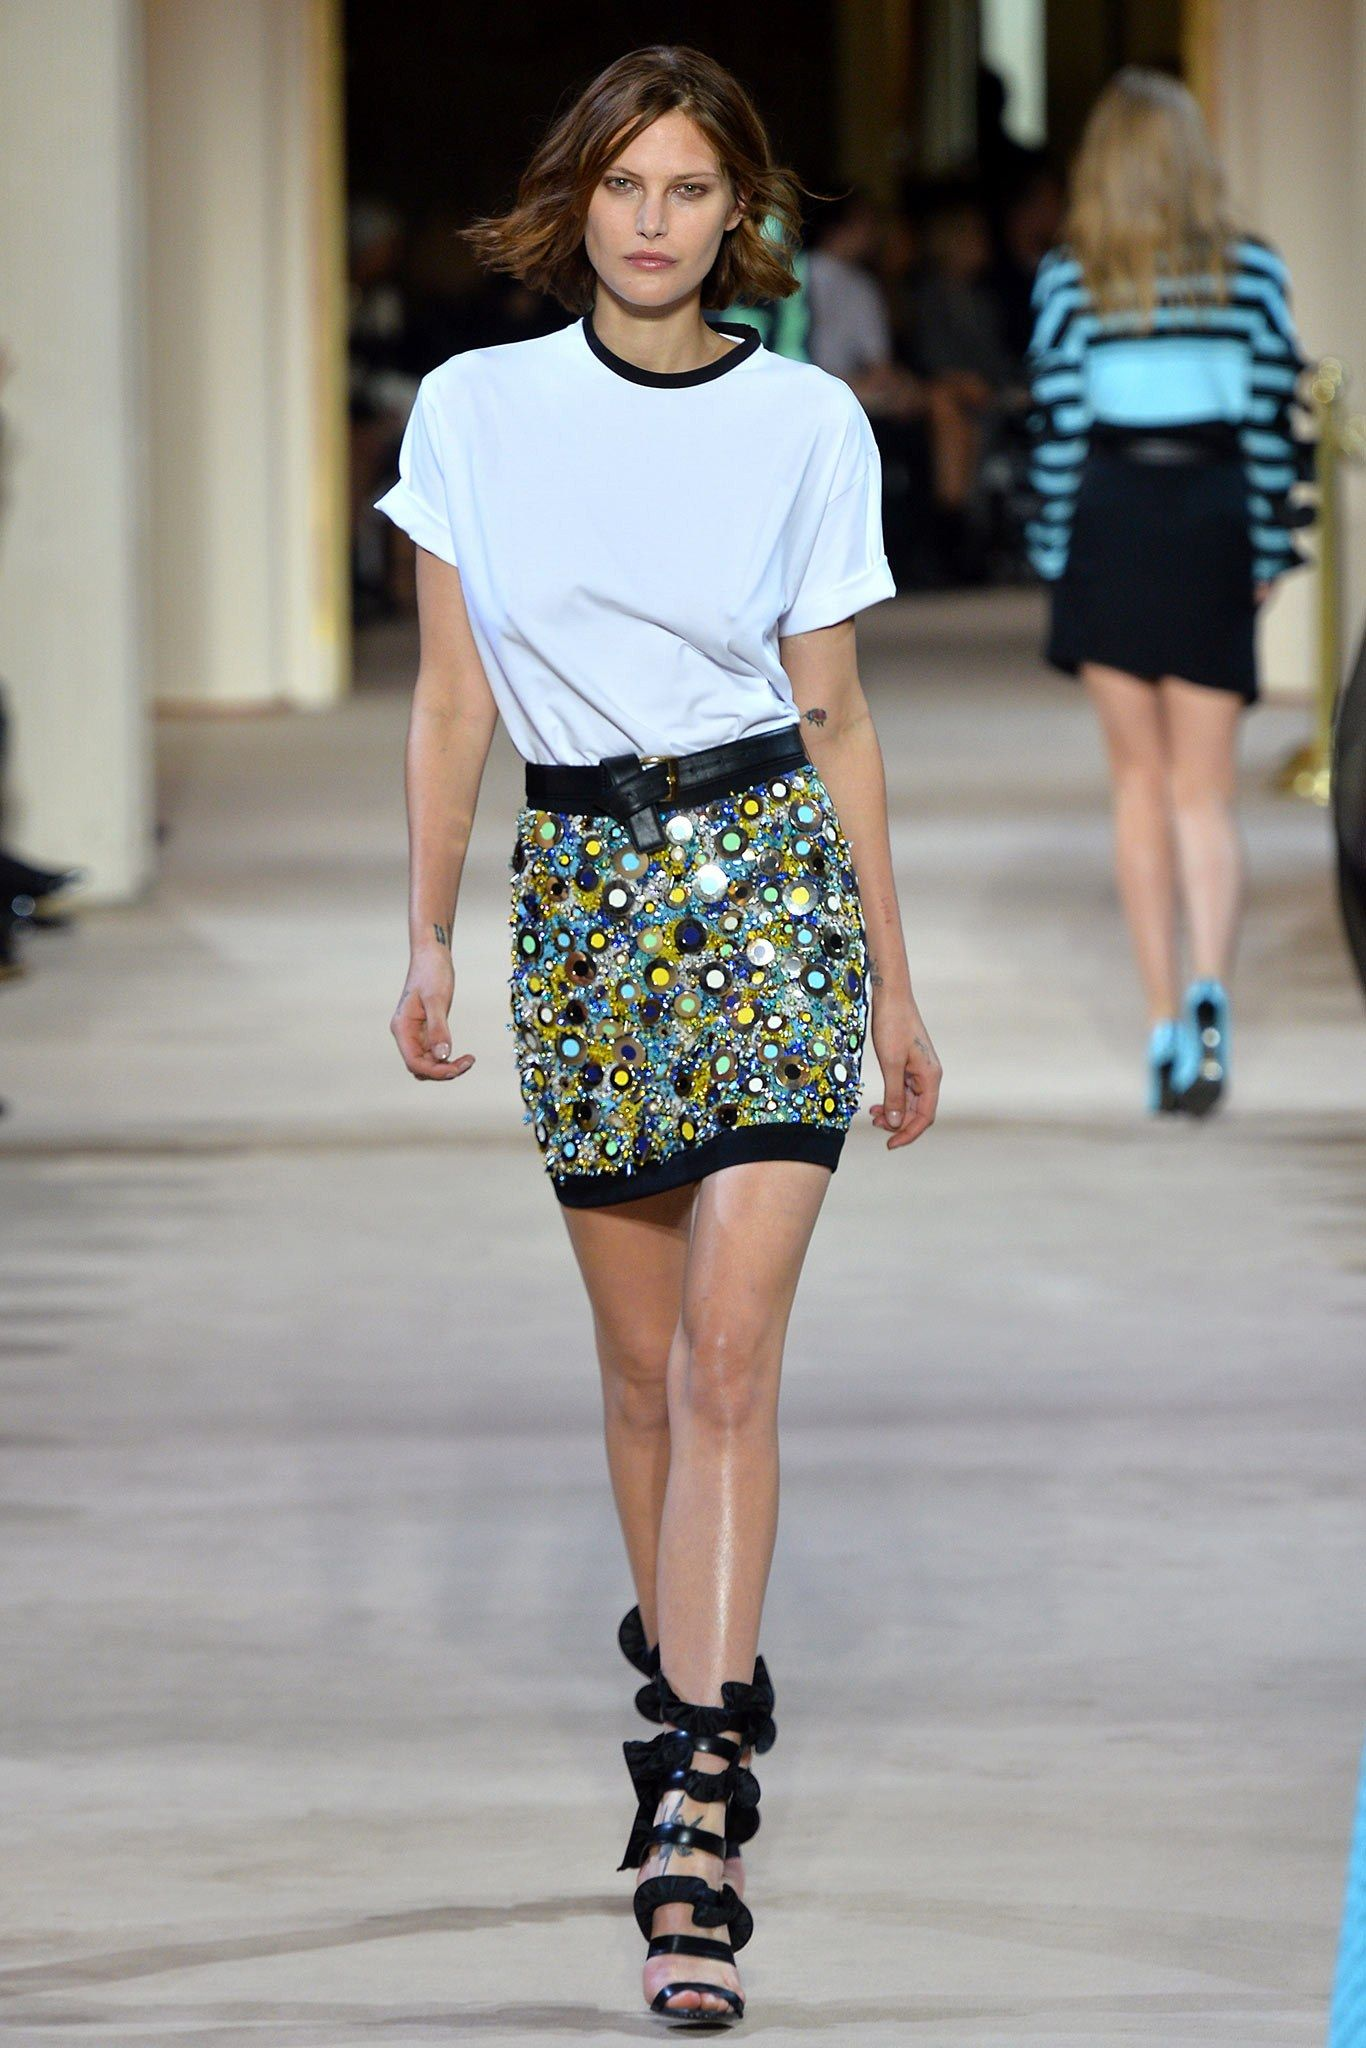 Emanuel Ungaro Spring 2014 Ready-to-Wear Collection Photos - Vogue